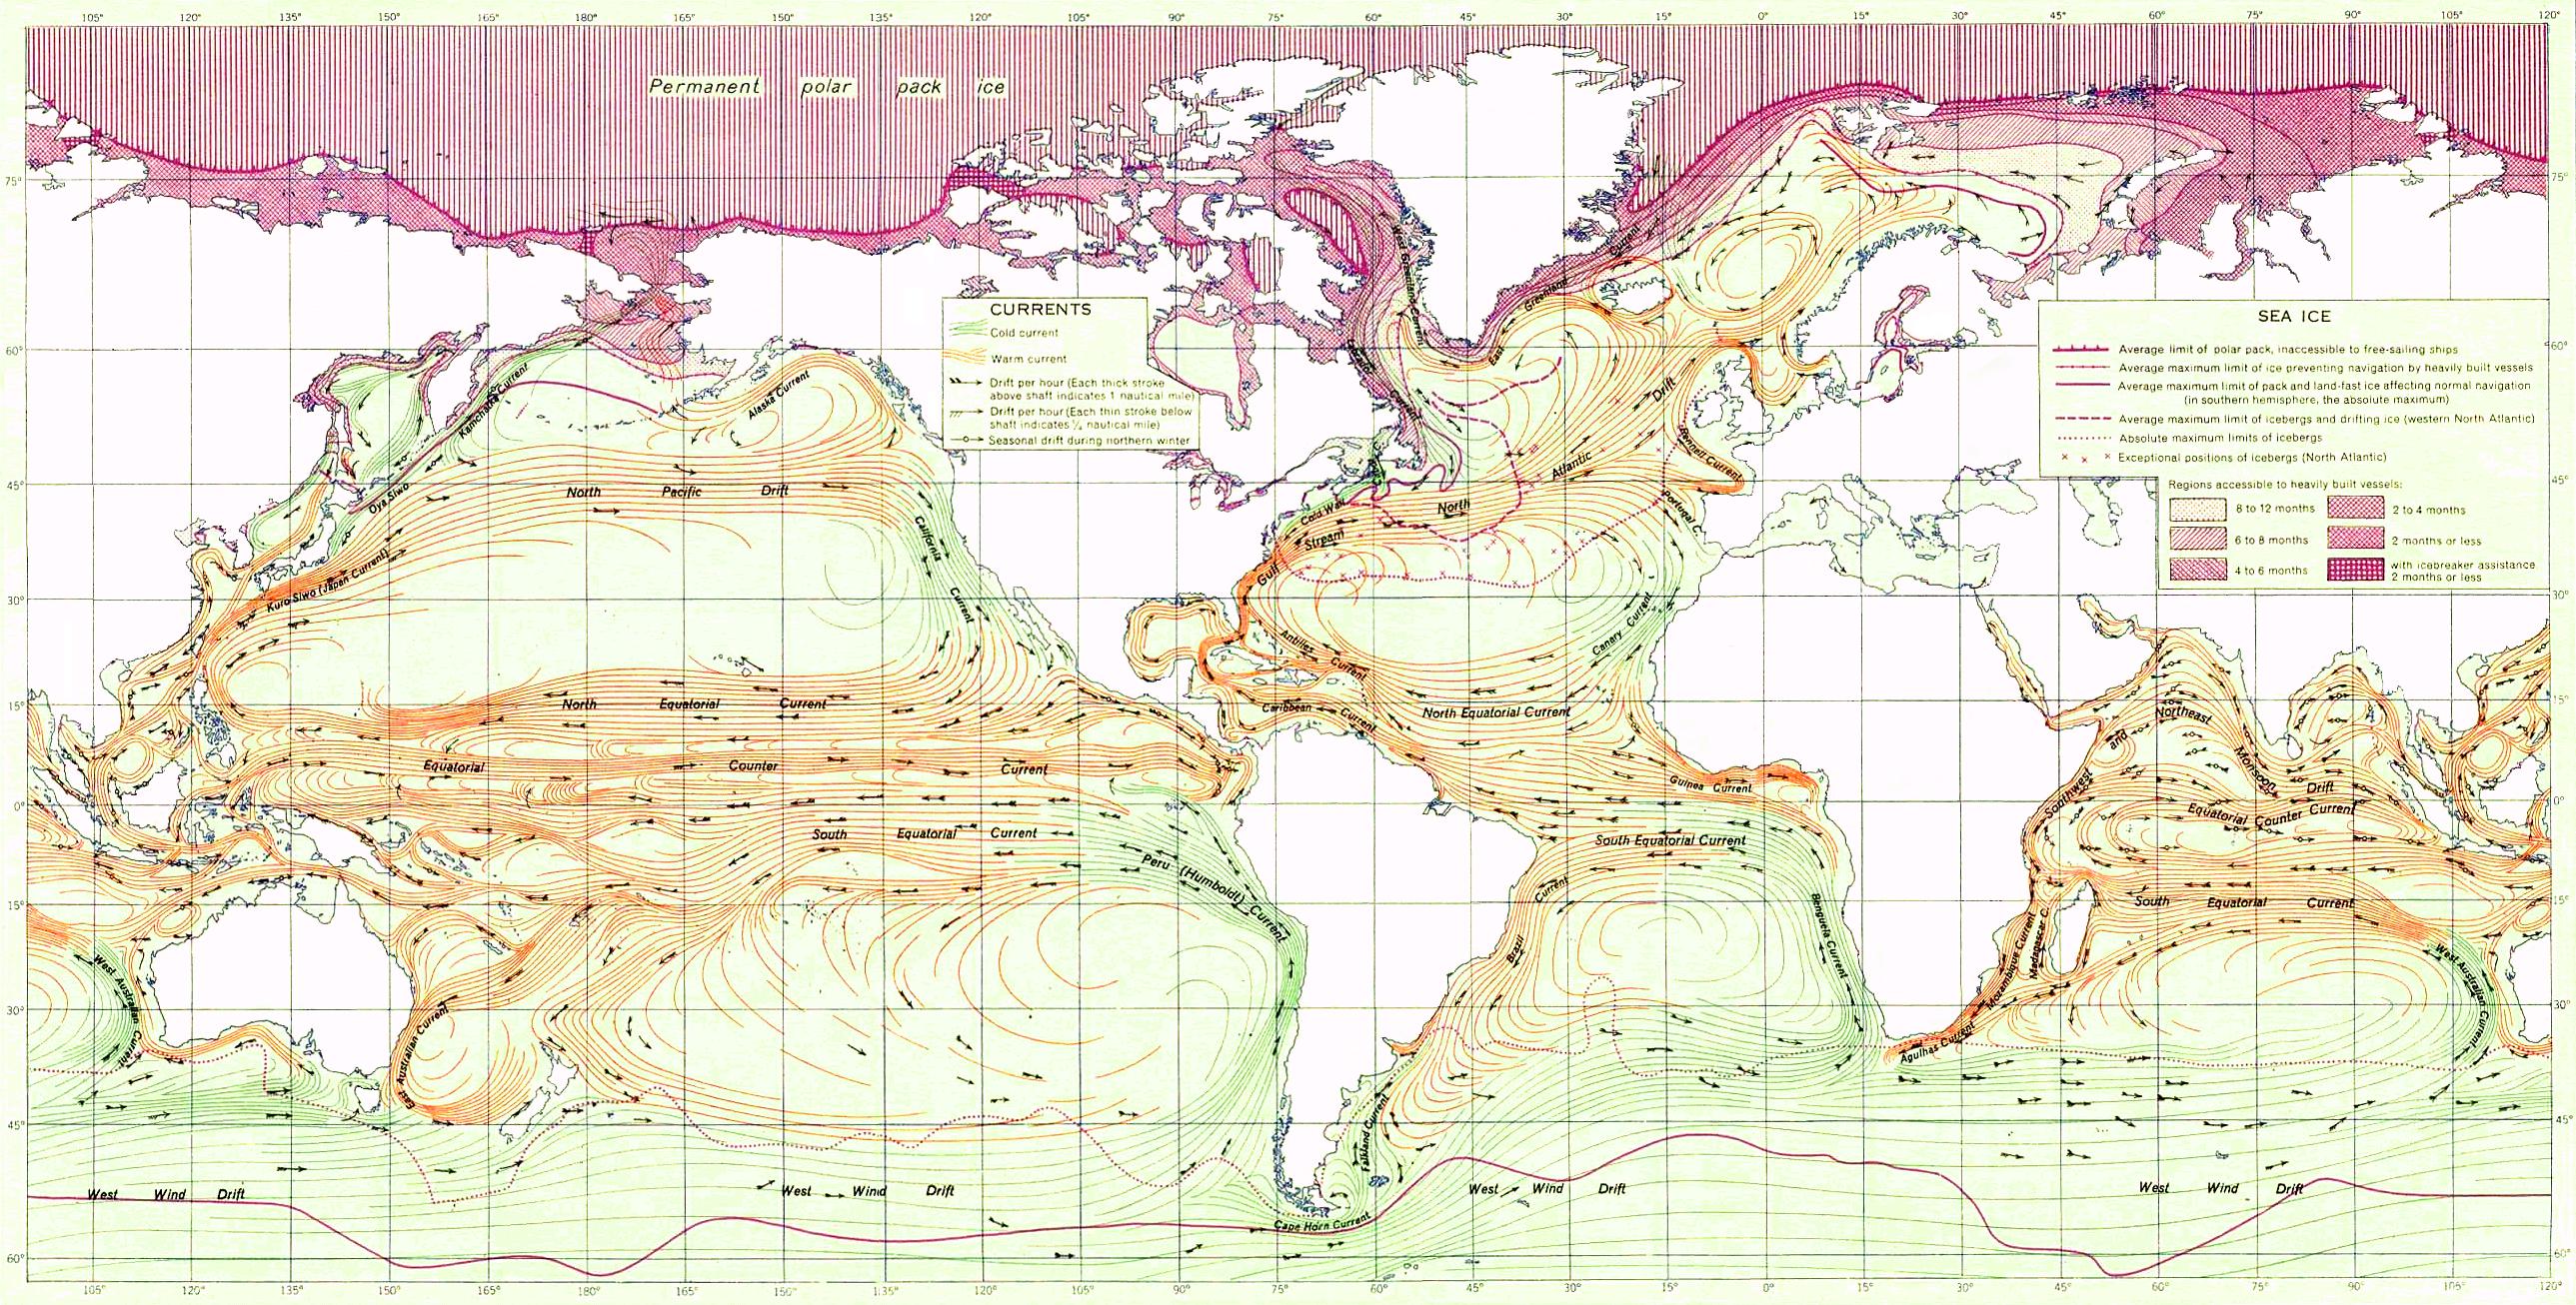 Ocean_currents_1943_%28borderless%293.png